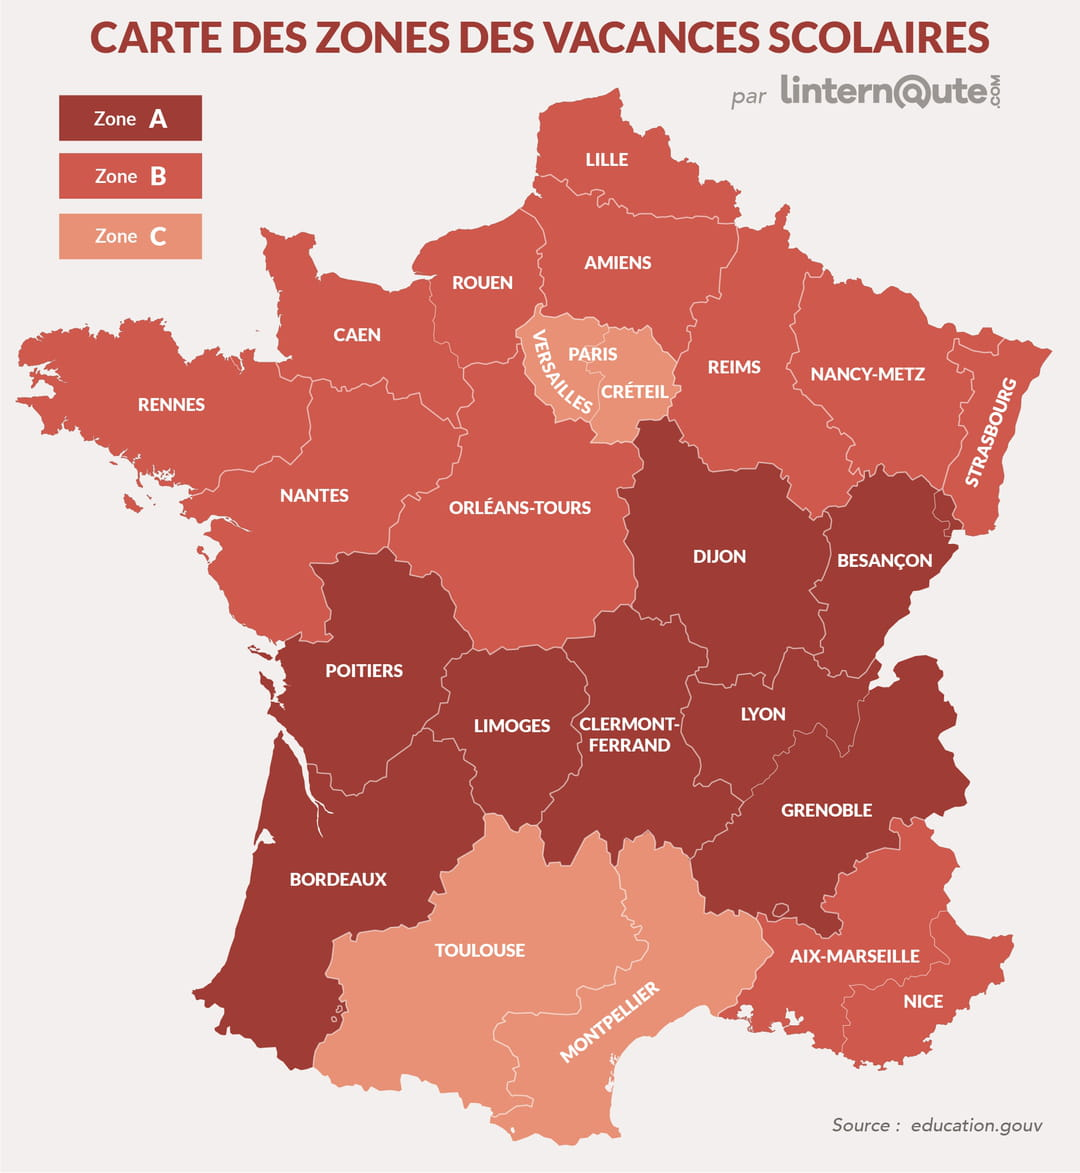 Calendrier Ramadan 2020 Caen.Calendrier Ramadan 2020 Marseille